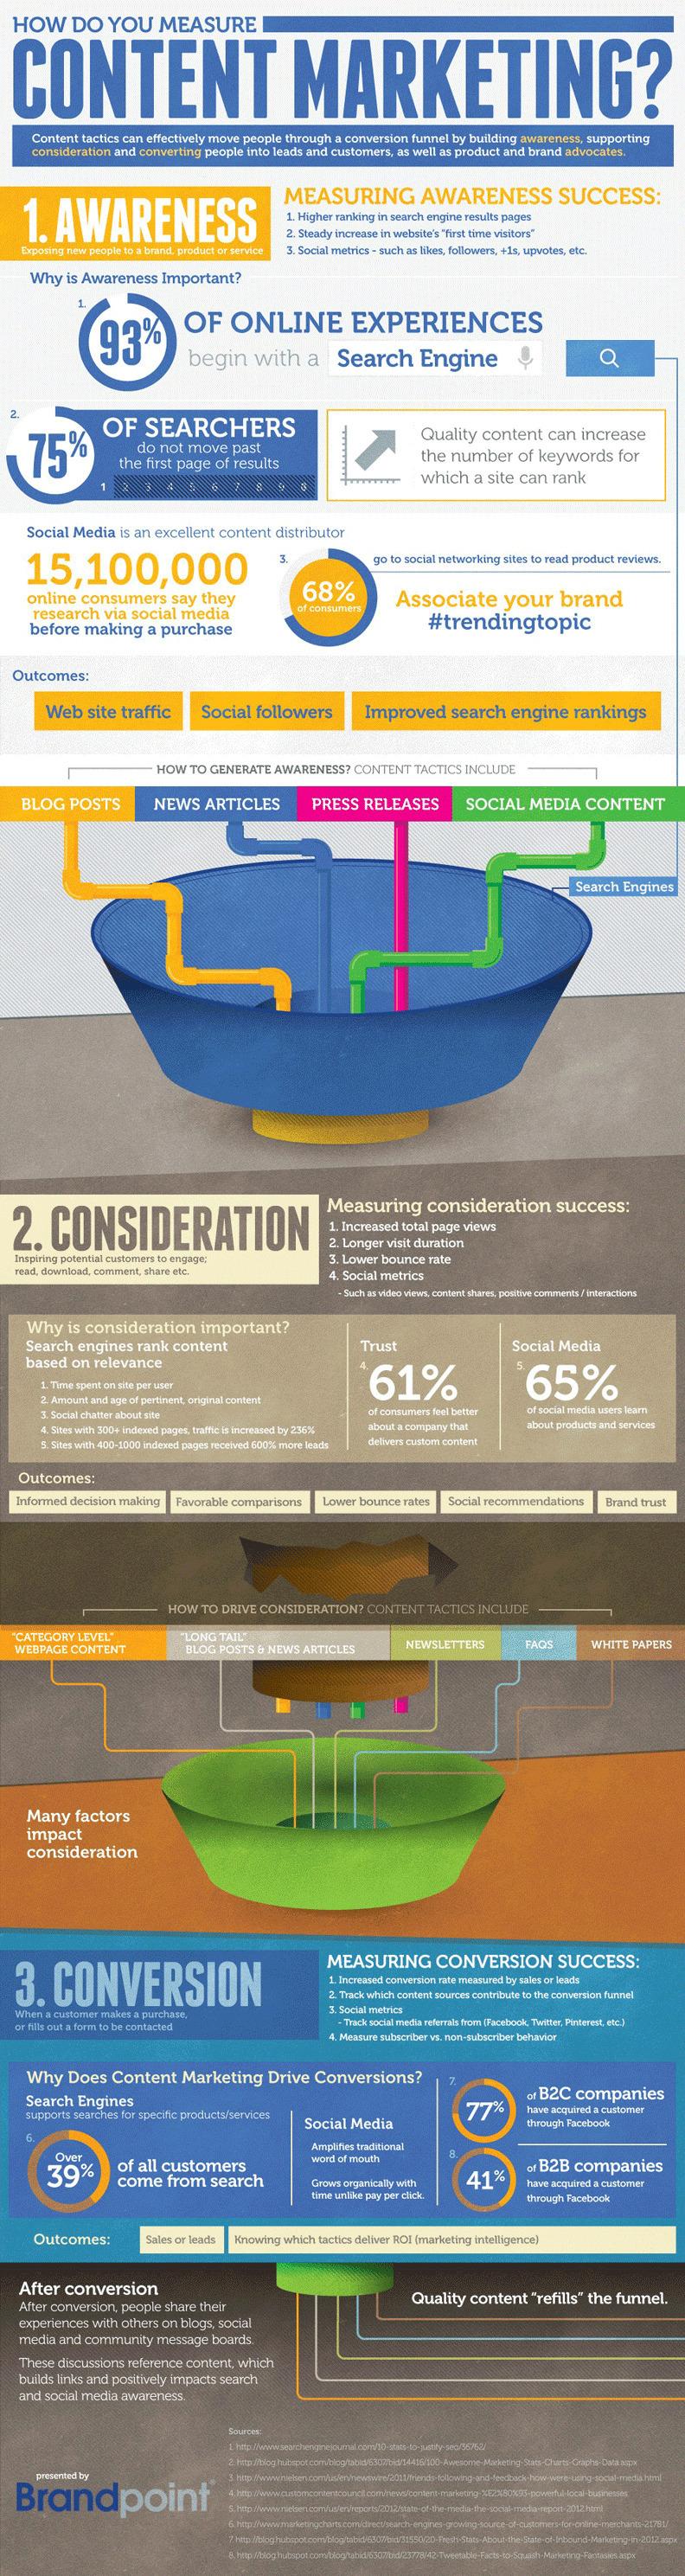 Infographic: Measuring Content Marketing Succes...